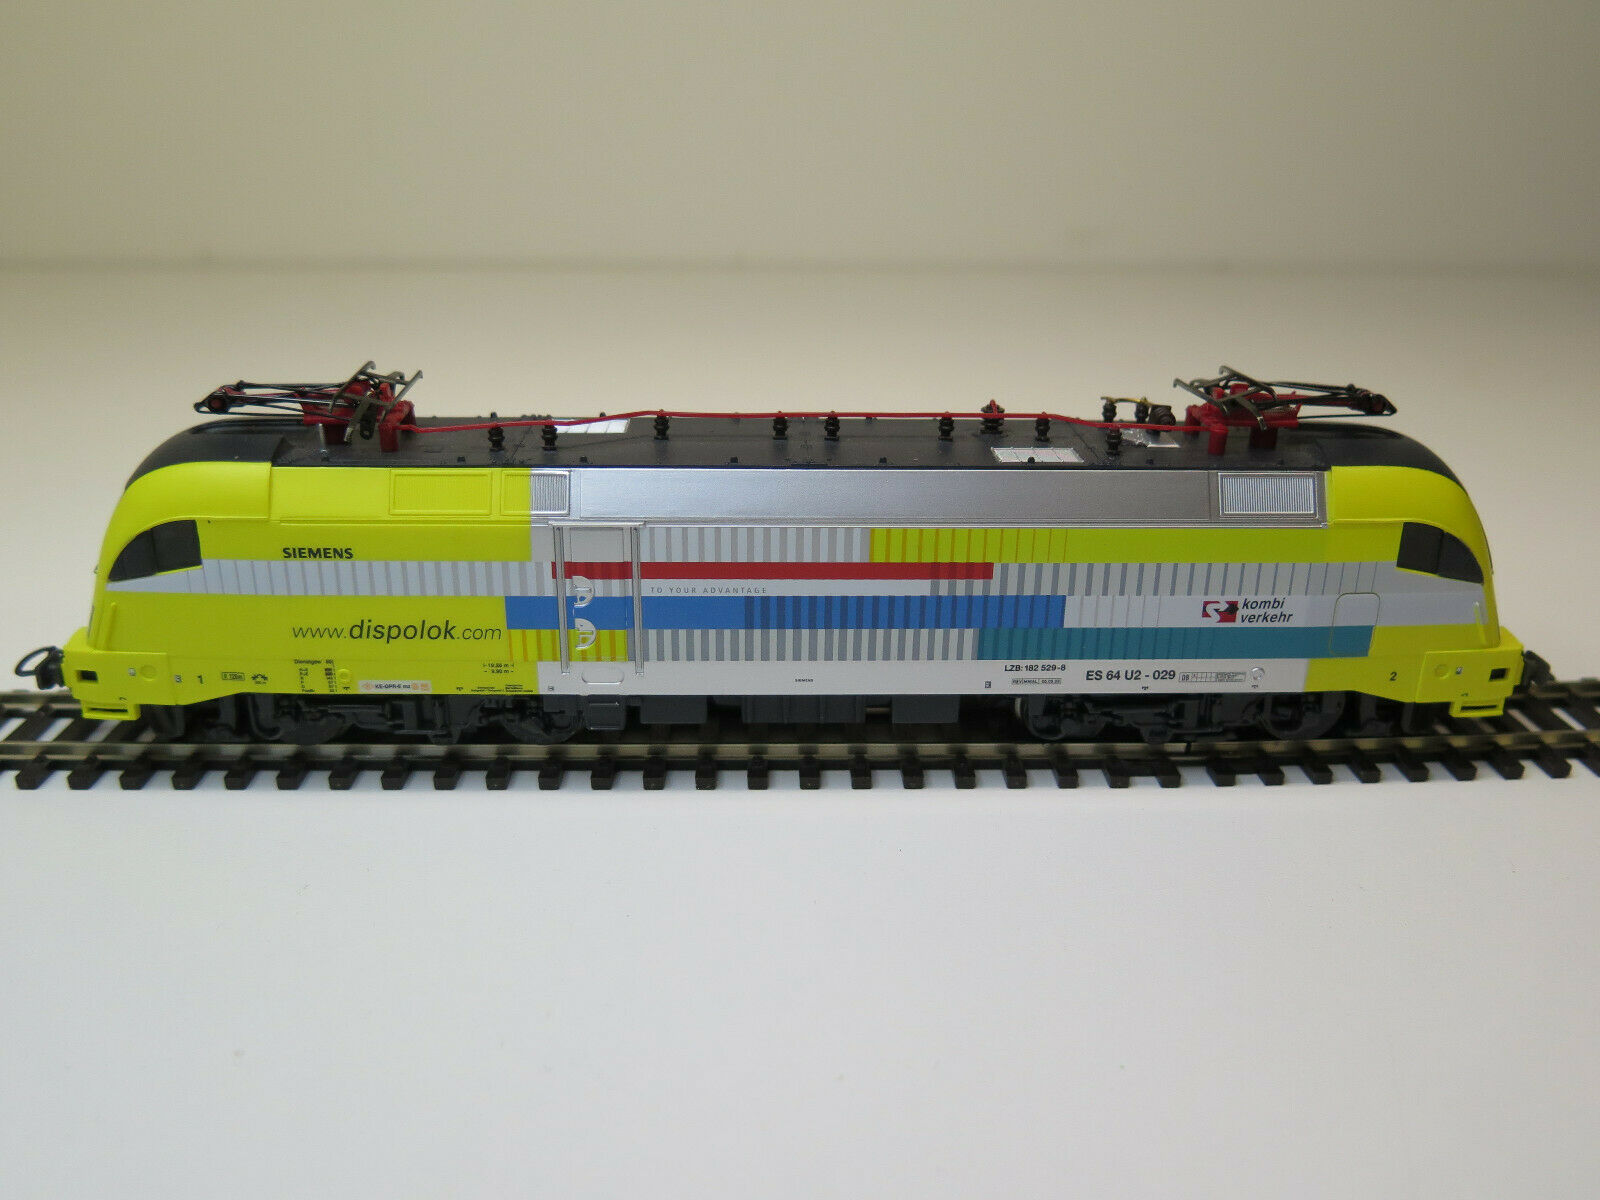 PIKO   pista H0 eléctrico 64 de locomotora Siemens Dispolok U2 - digital     19 42 6